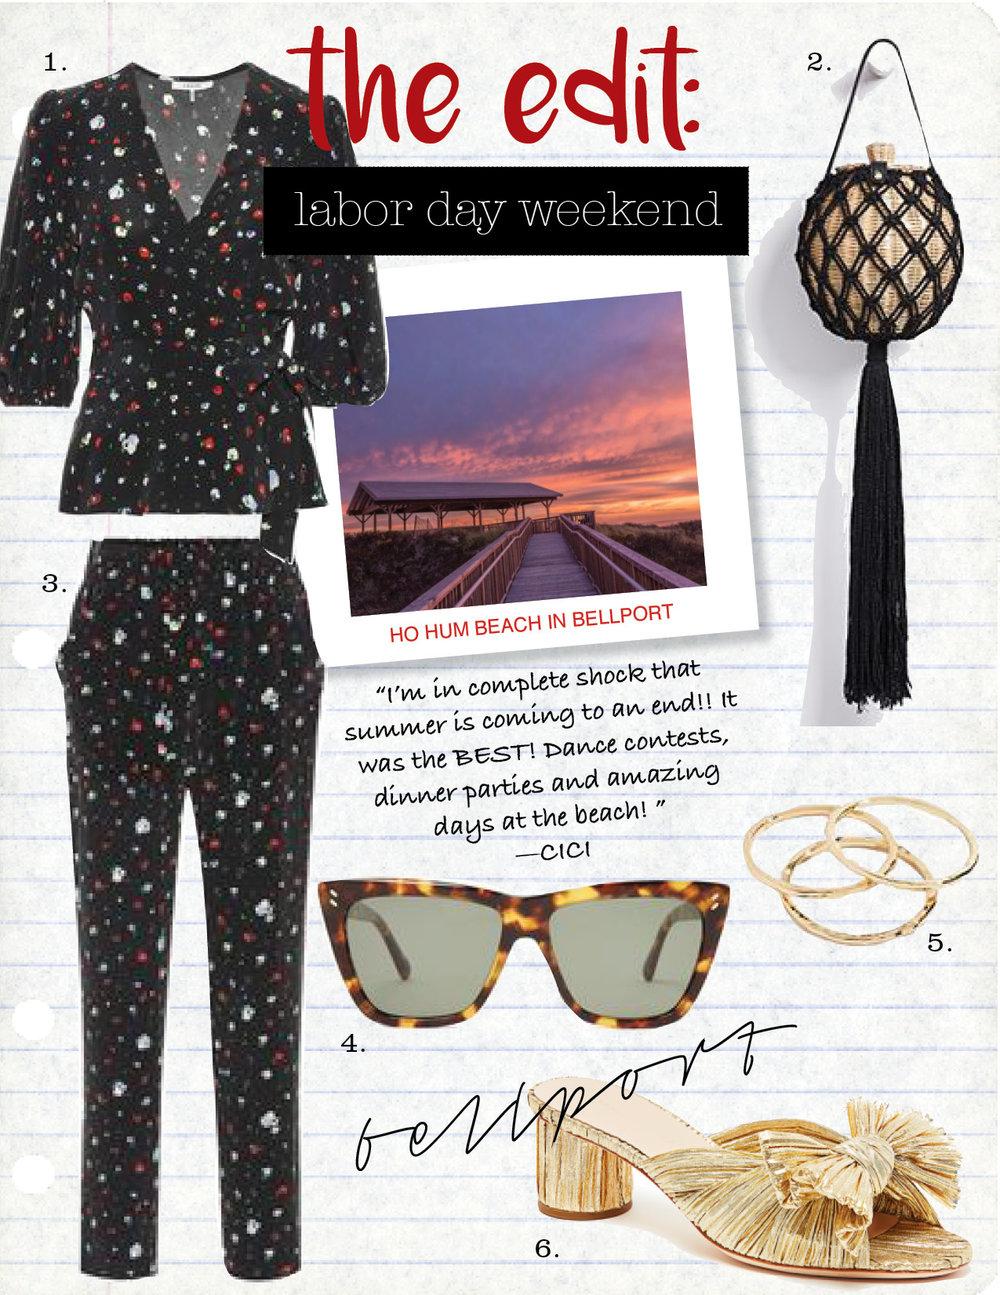 1. ganni nolana floral silk top, $315,  mytheresa.com  2. ulla johnson leia bag, $425,  shopbop.com  3. ganni nolana floral silk pants, $295,  mytheresa.com  4. stella maccartney cat-eye tortoiseshell sunglasses, $260,  matchesfashion.com  5. gorjana g rings set of 3, $45,  shopbop.com  6. loeffler randall emilia pleated knot slide, $350,  loefflerrandall.com